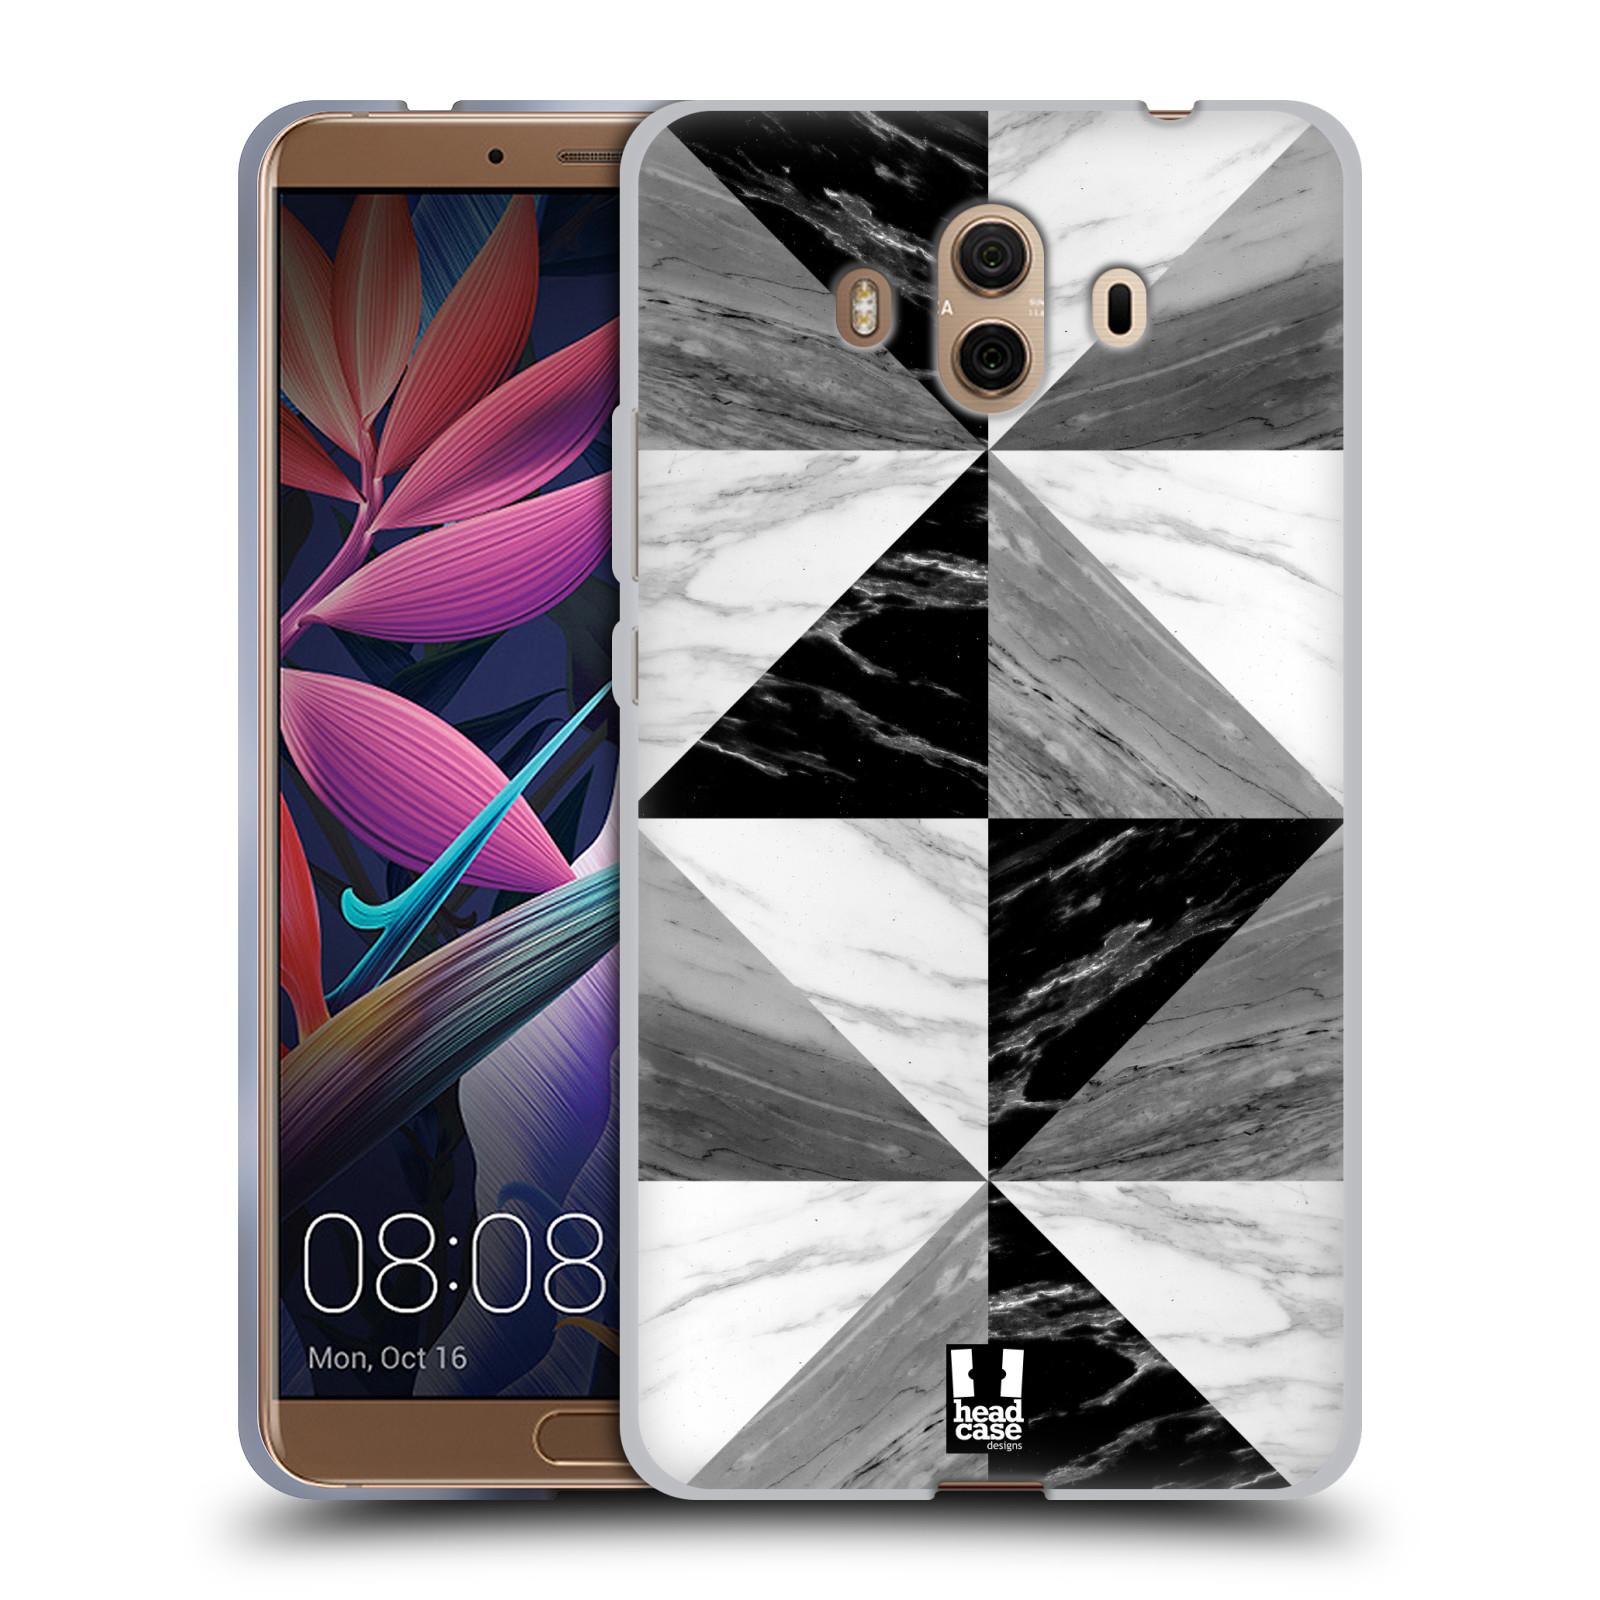 Silikonové pouzdro na mobil Huawei Mate 10 - Head Case - Mramor triangl